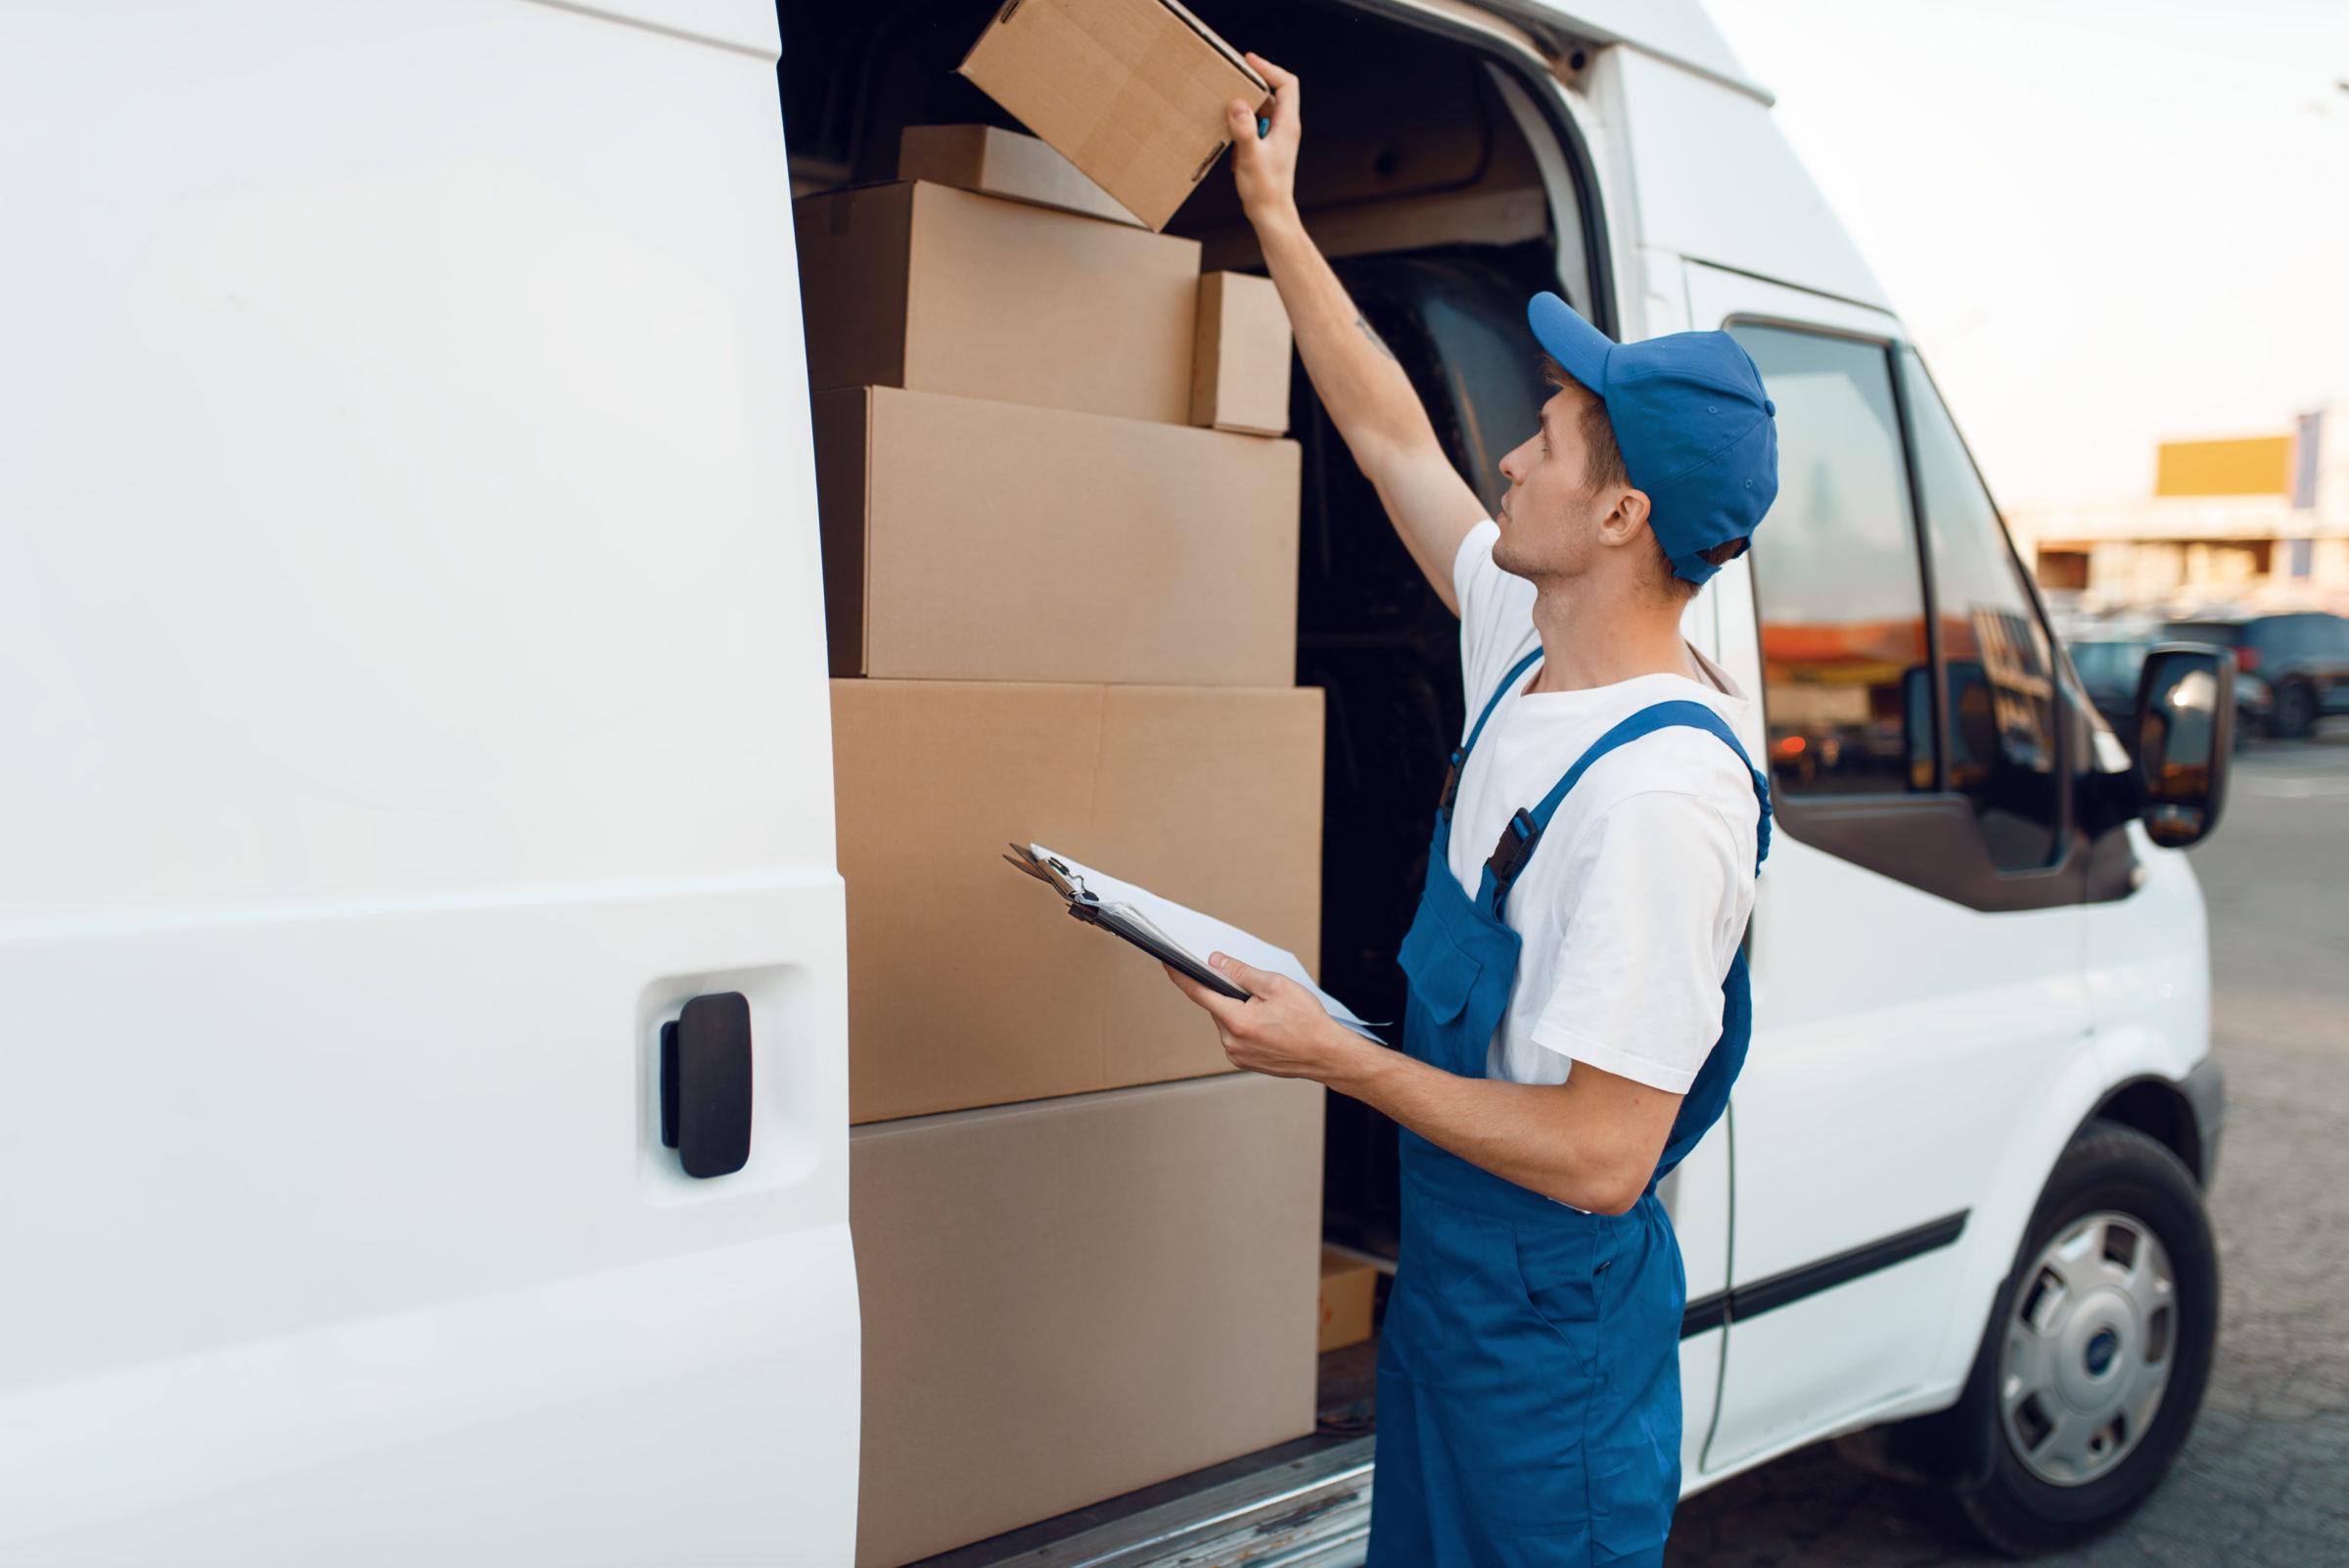 deliveryman in uniform check boxes in the car 2021 04 03 14 38 23 utc